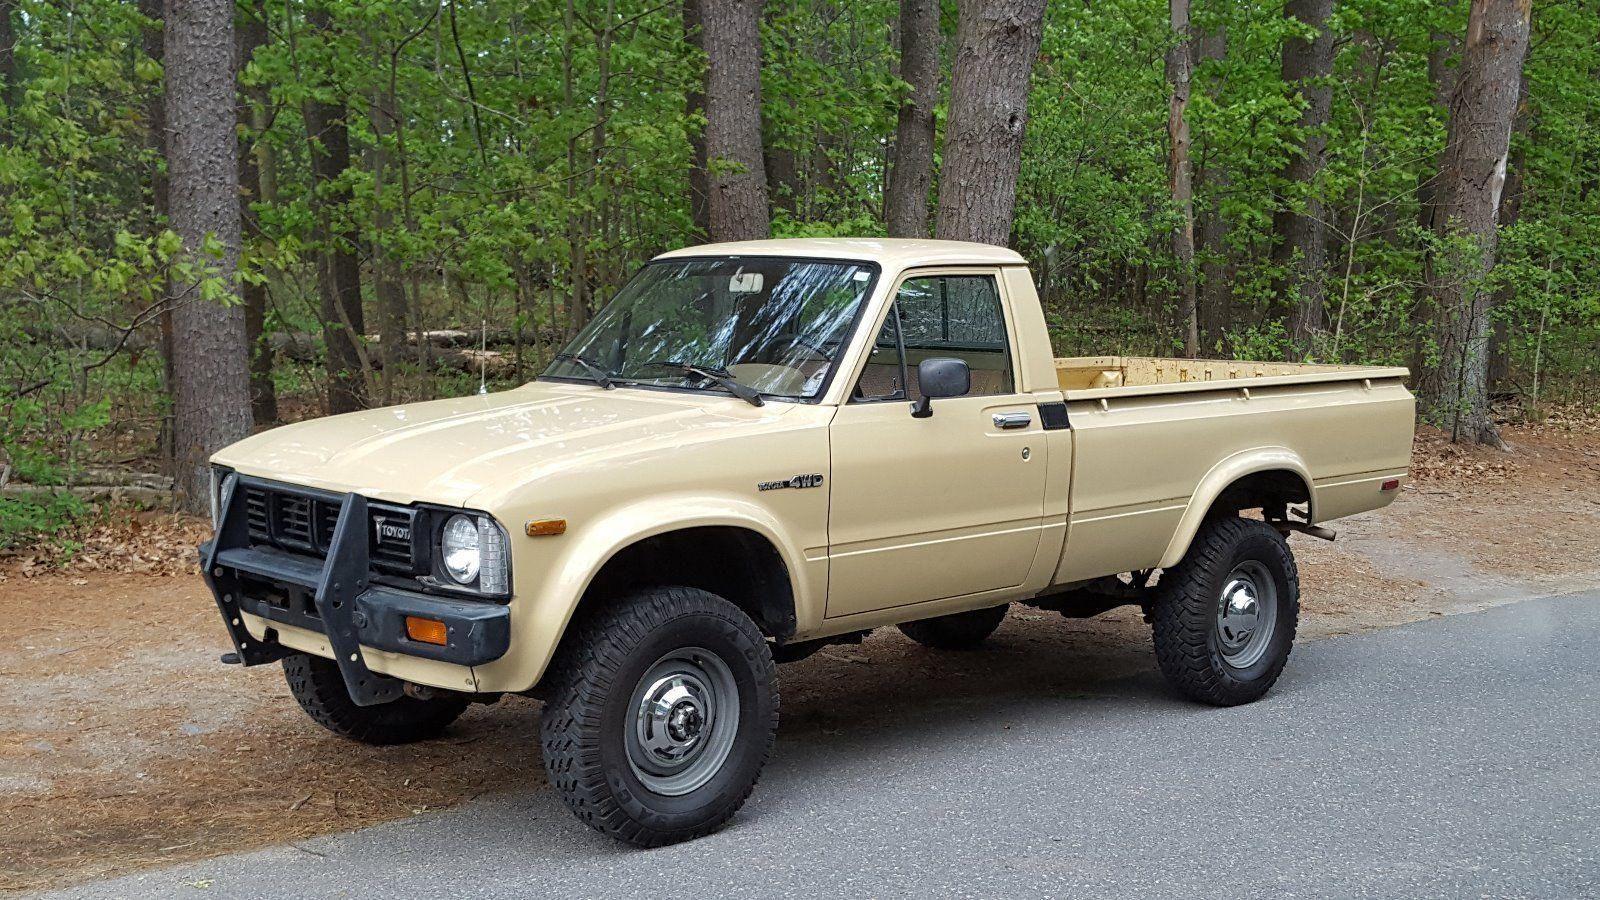 1980 Toyota Pickup | Toyota hilux, Toyota trucks, Toyota pickup 4x4